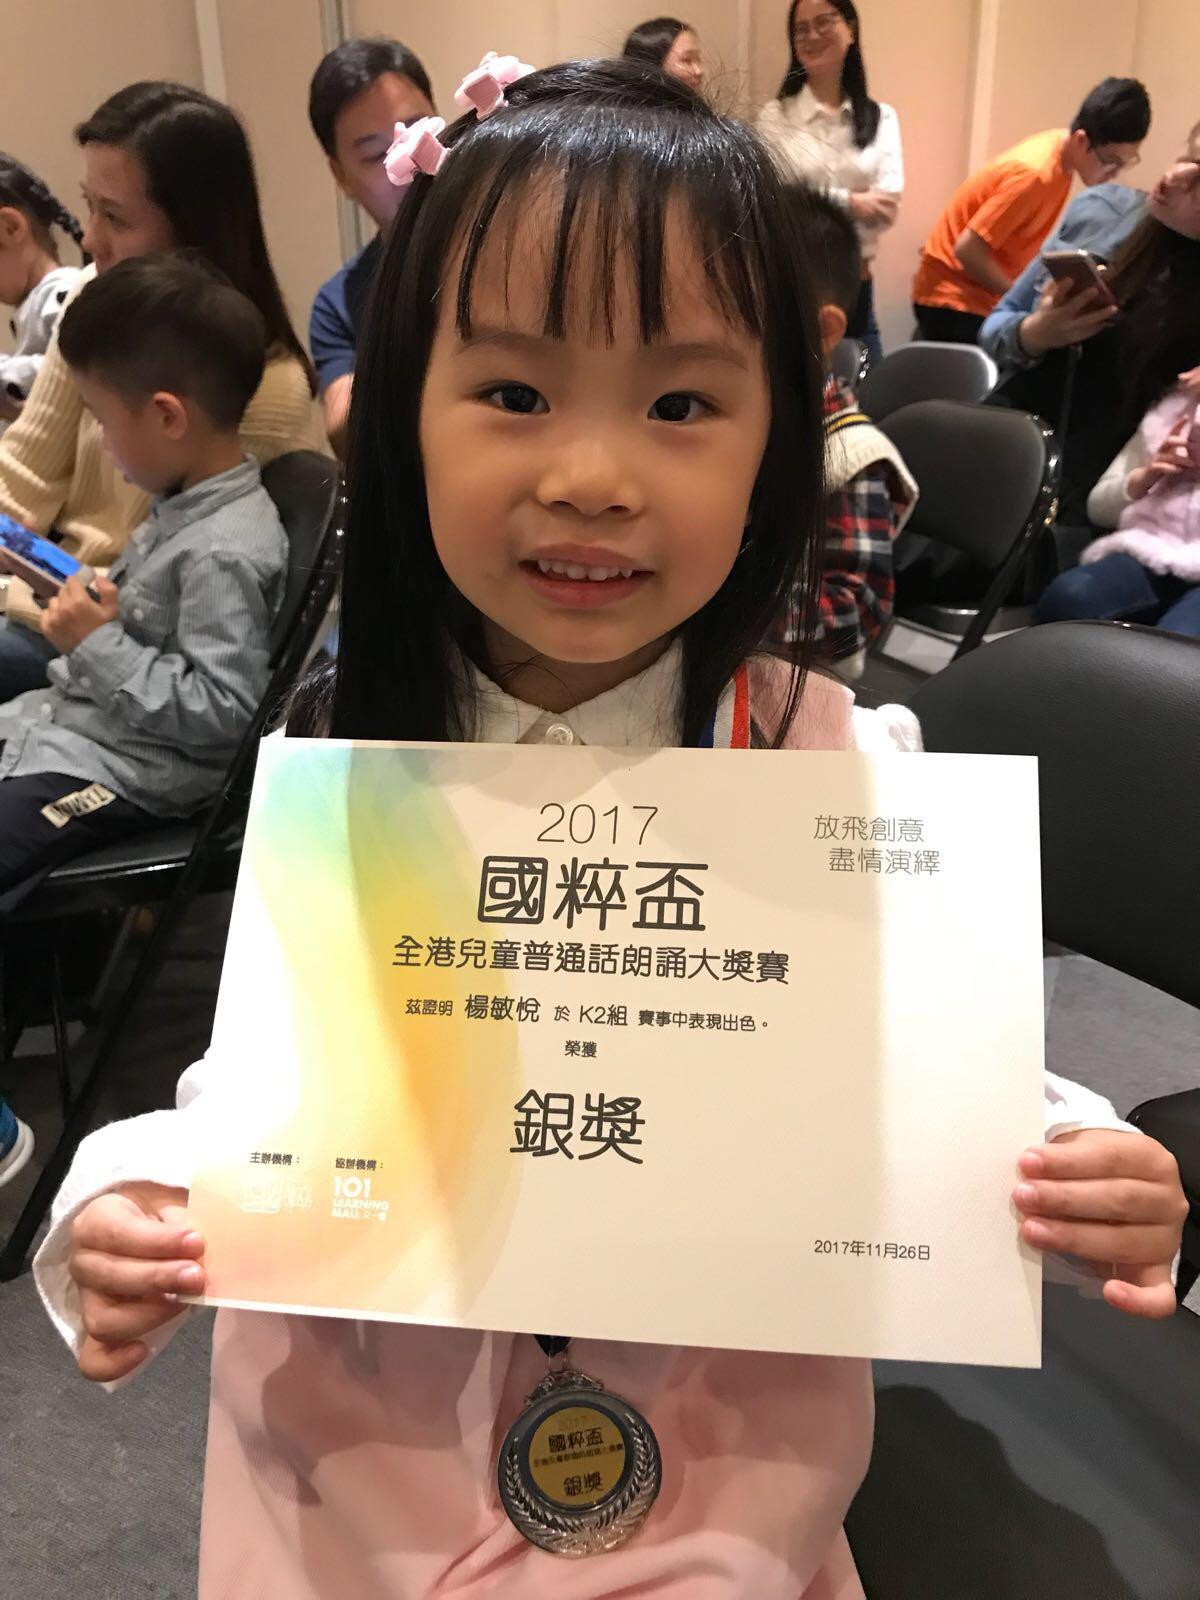 最新消息 - 中國文化漢語藝術工坊 - Chinese Language Arts and Culture Academy